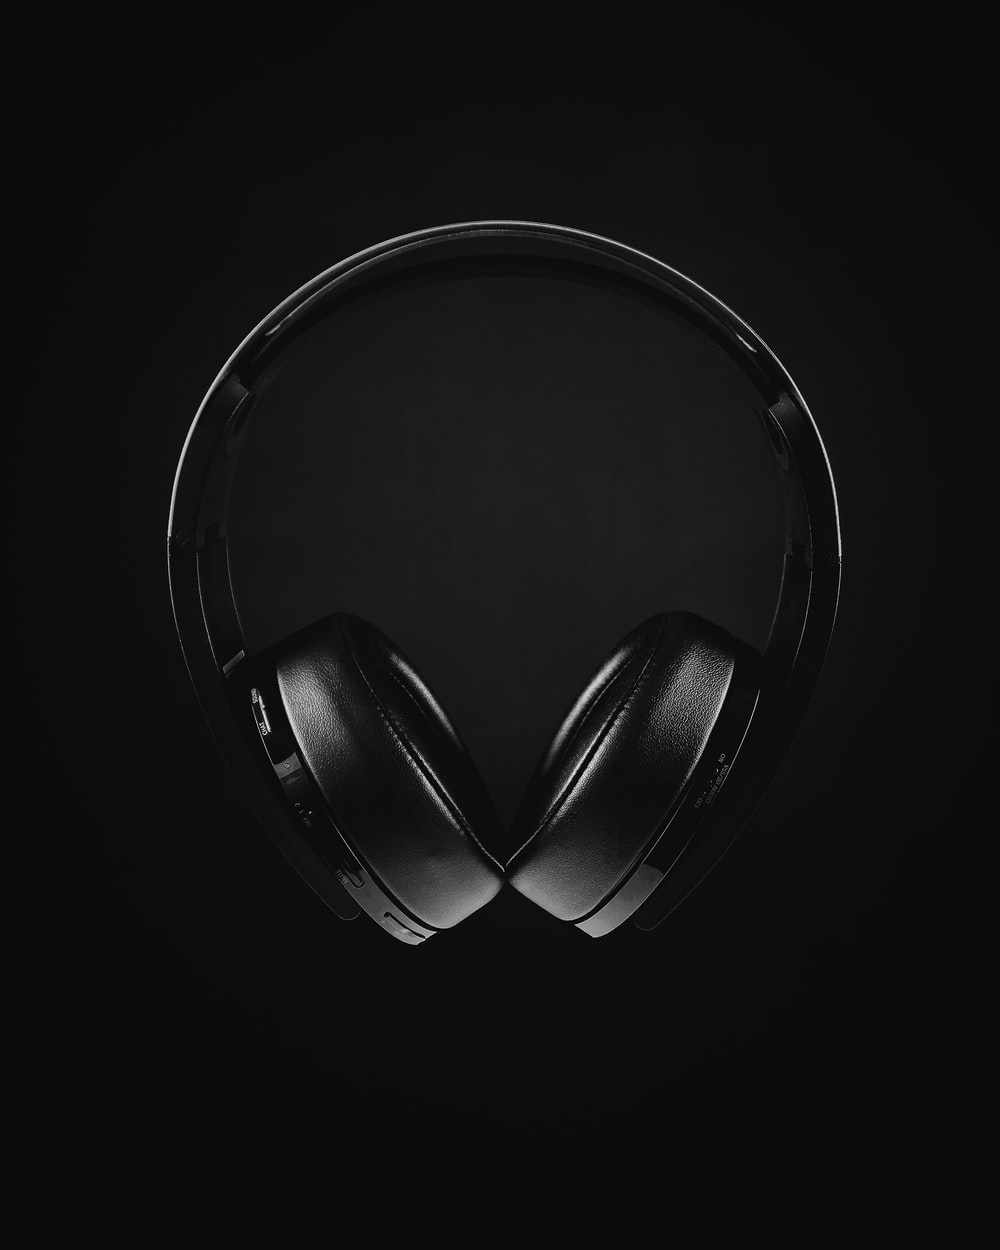 black and white photo of headphones